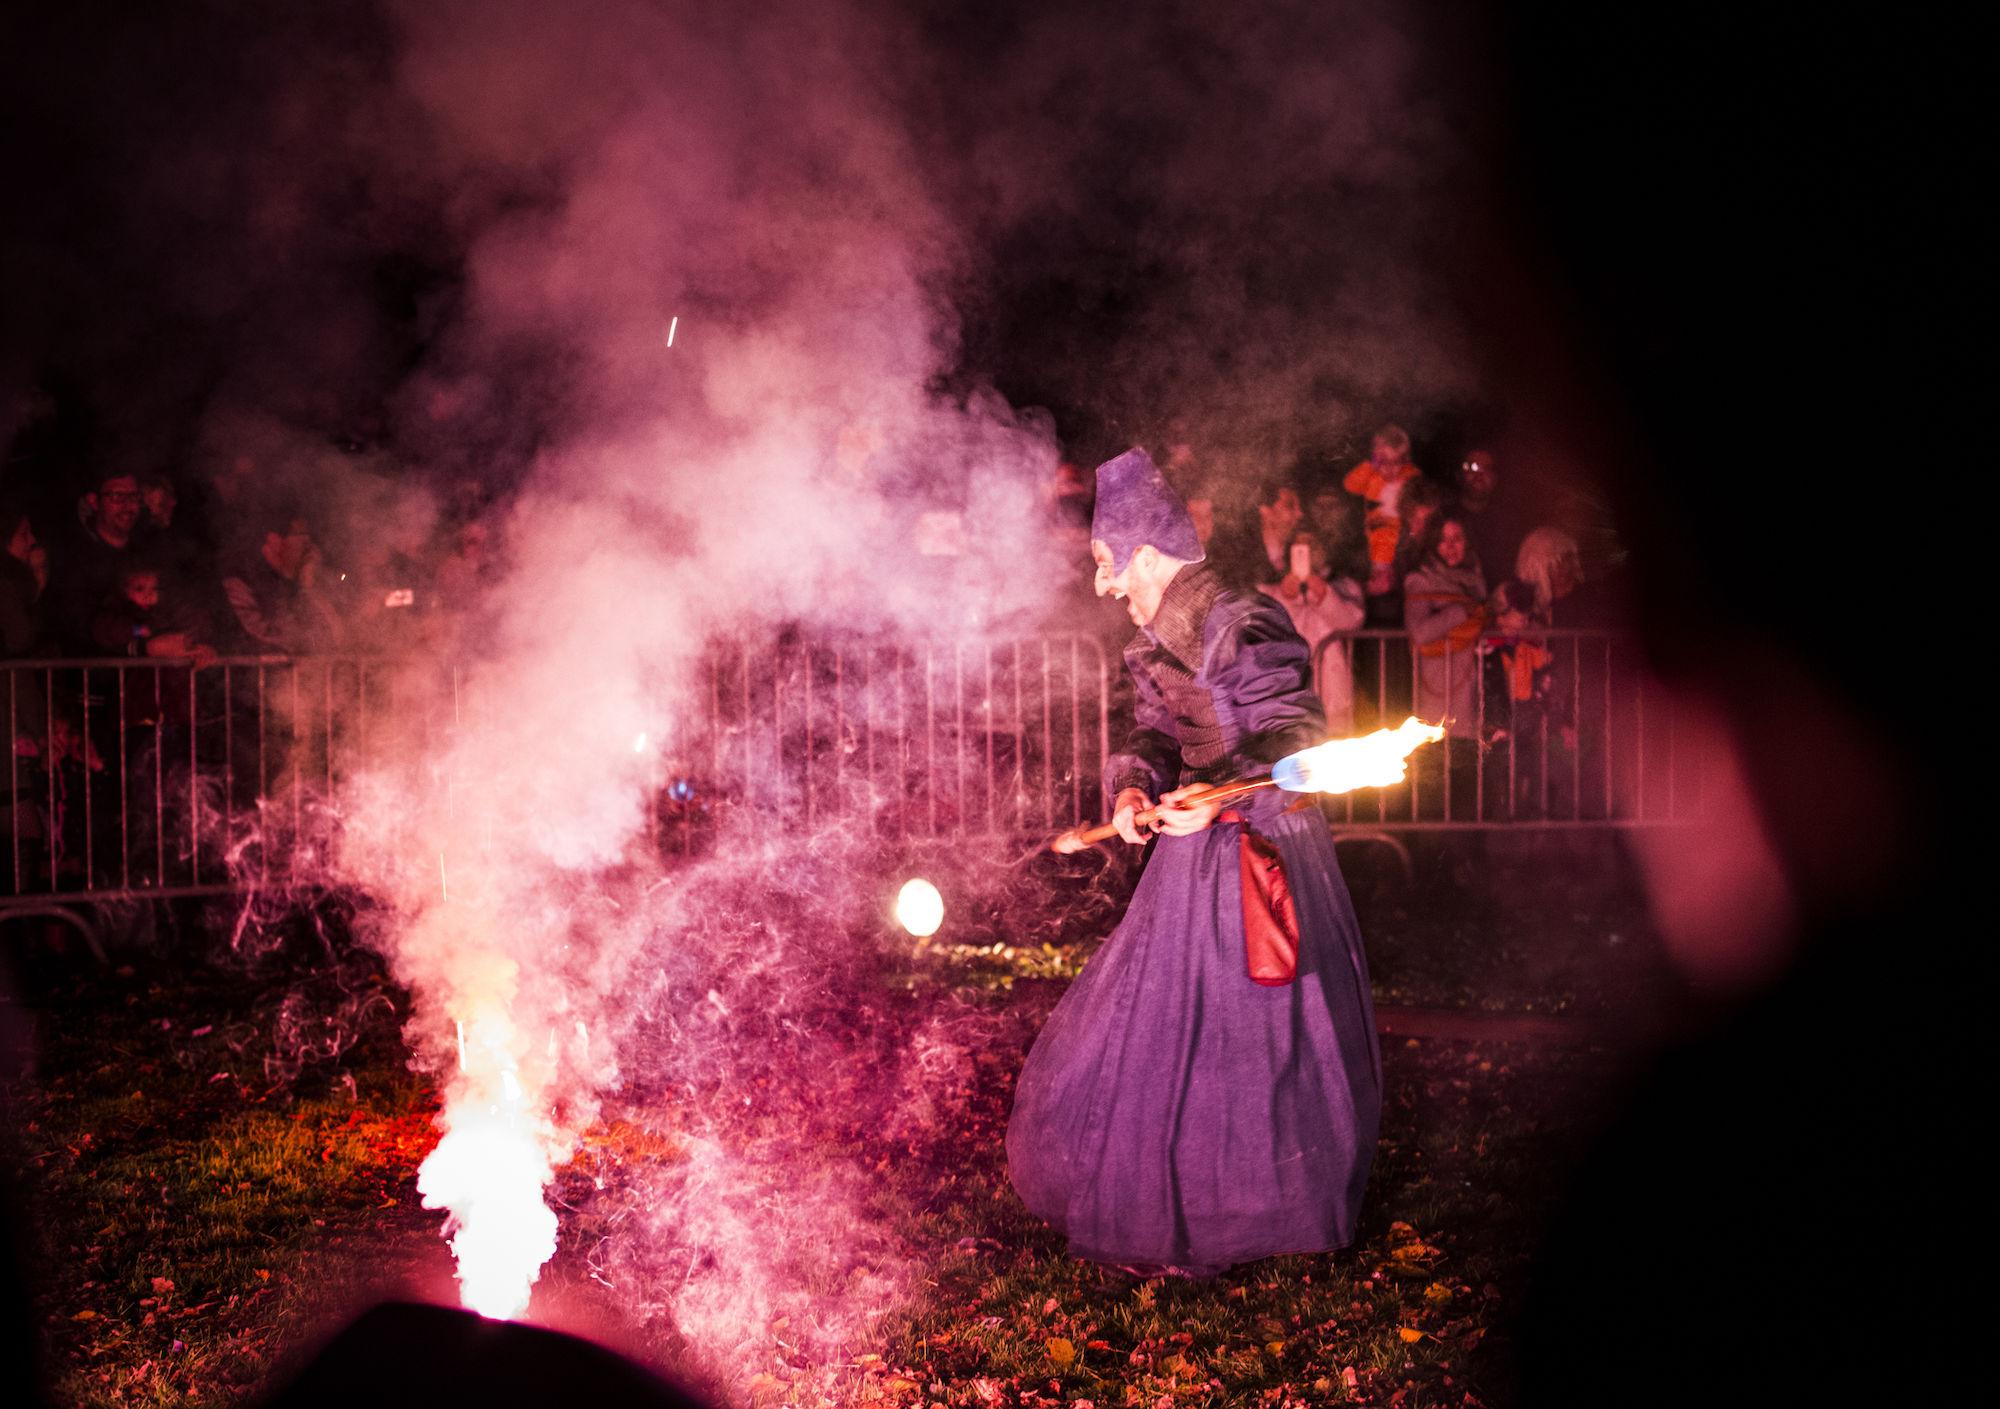 171029-Puyenbroeck-halloween-00152.jpg